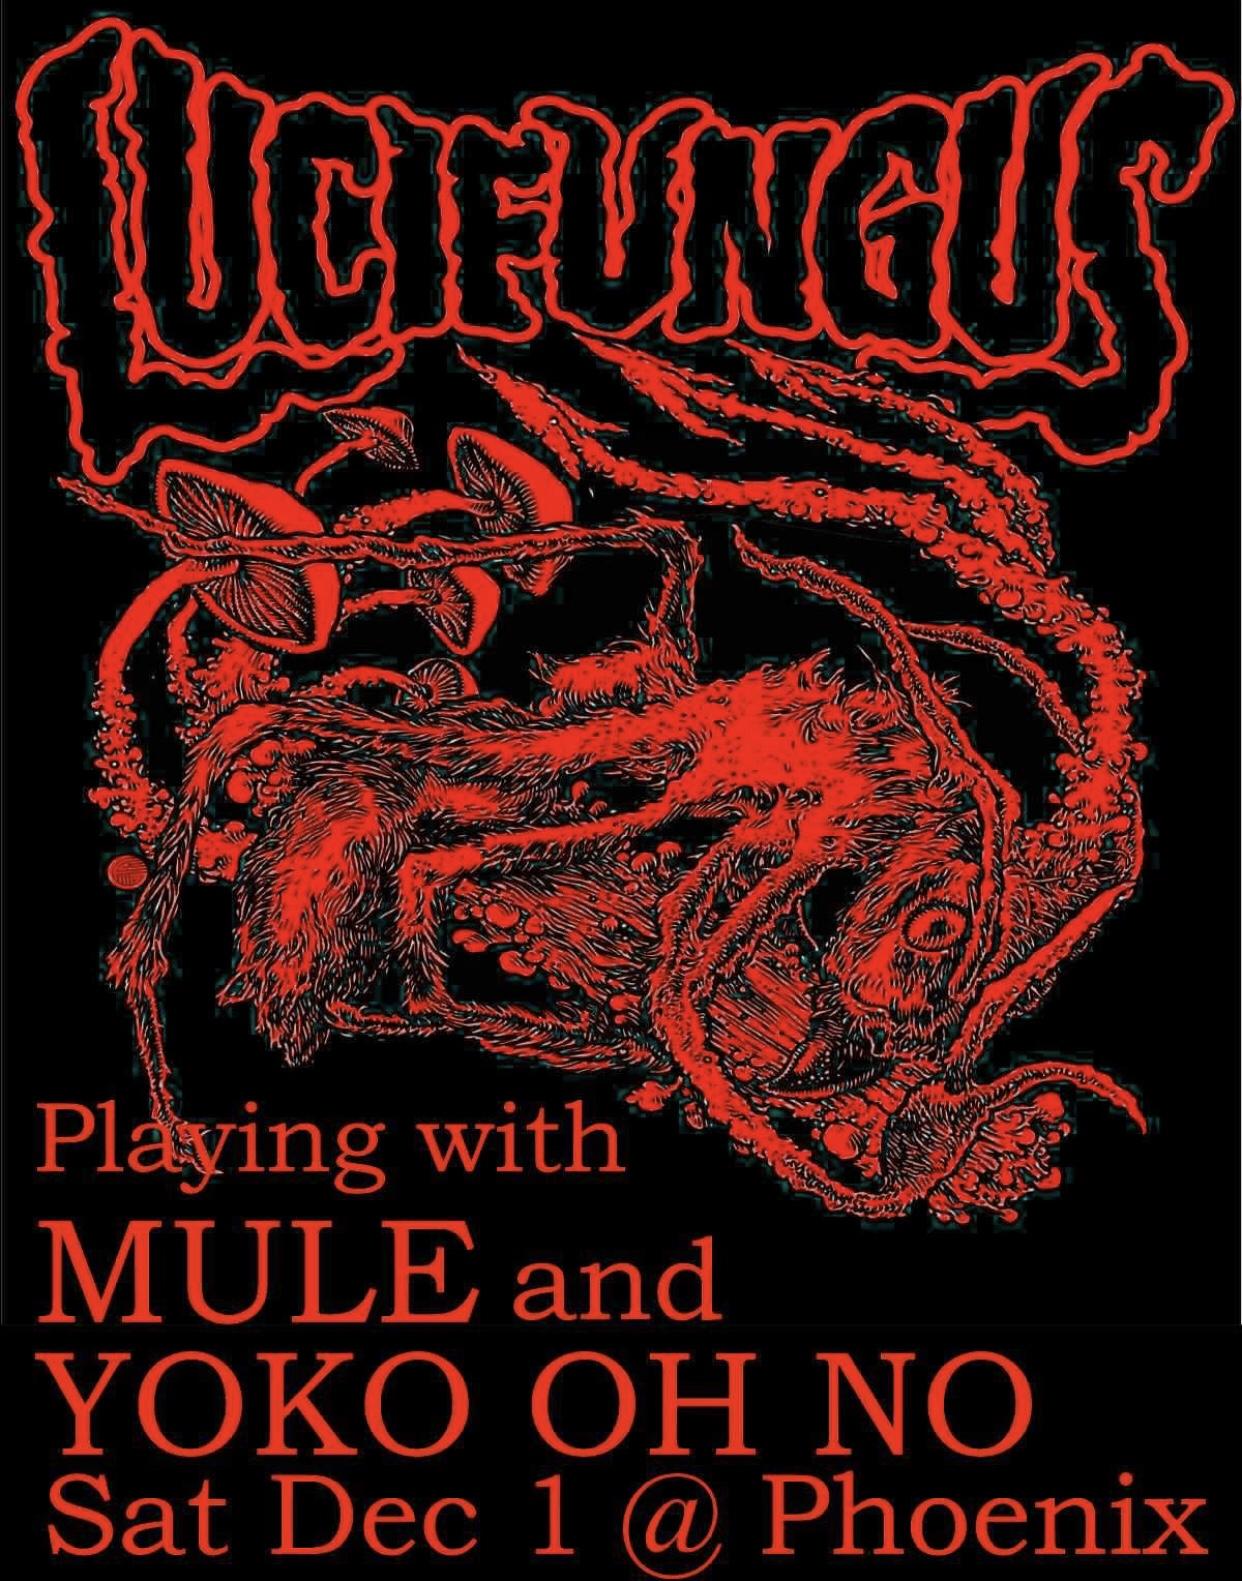 Lucifungus, Mule & Yoko Oh No Play The Phoenix